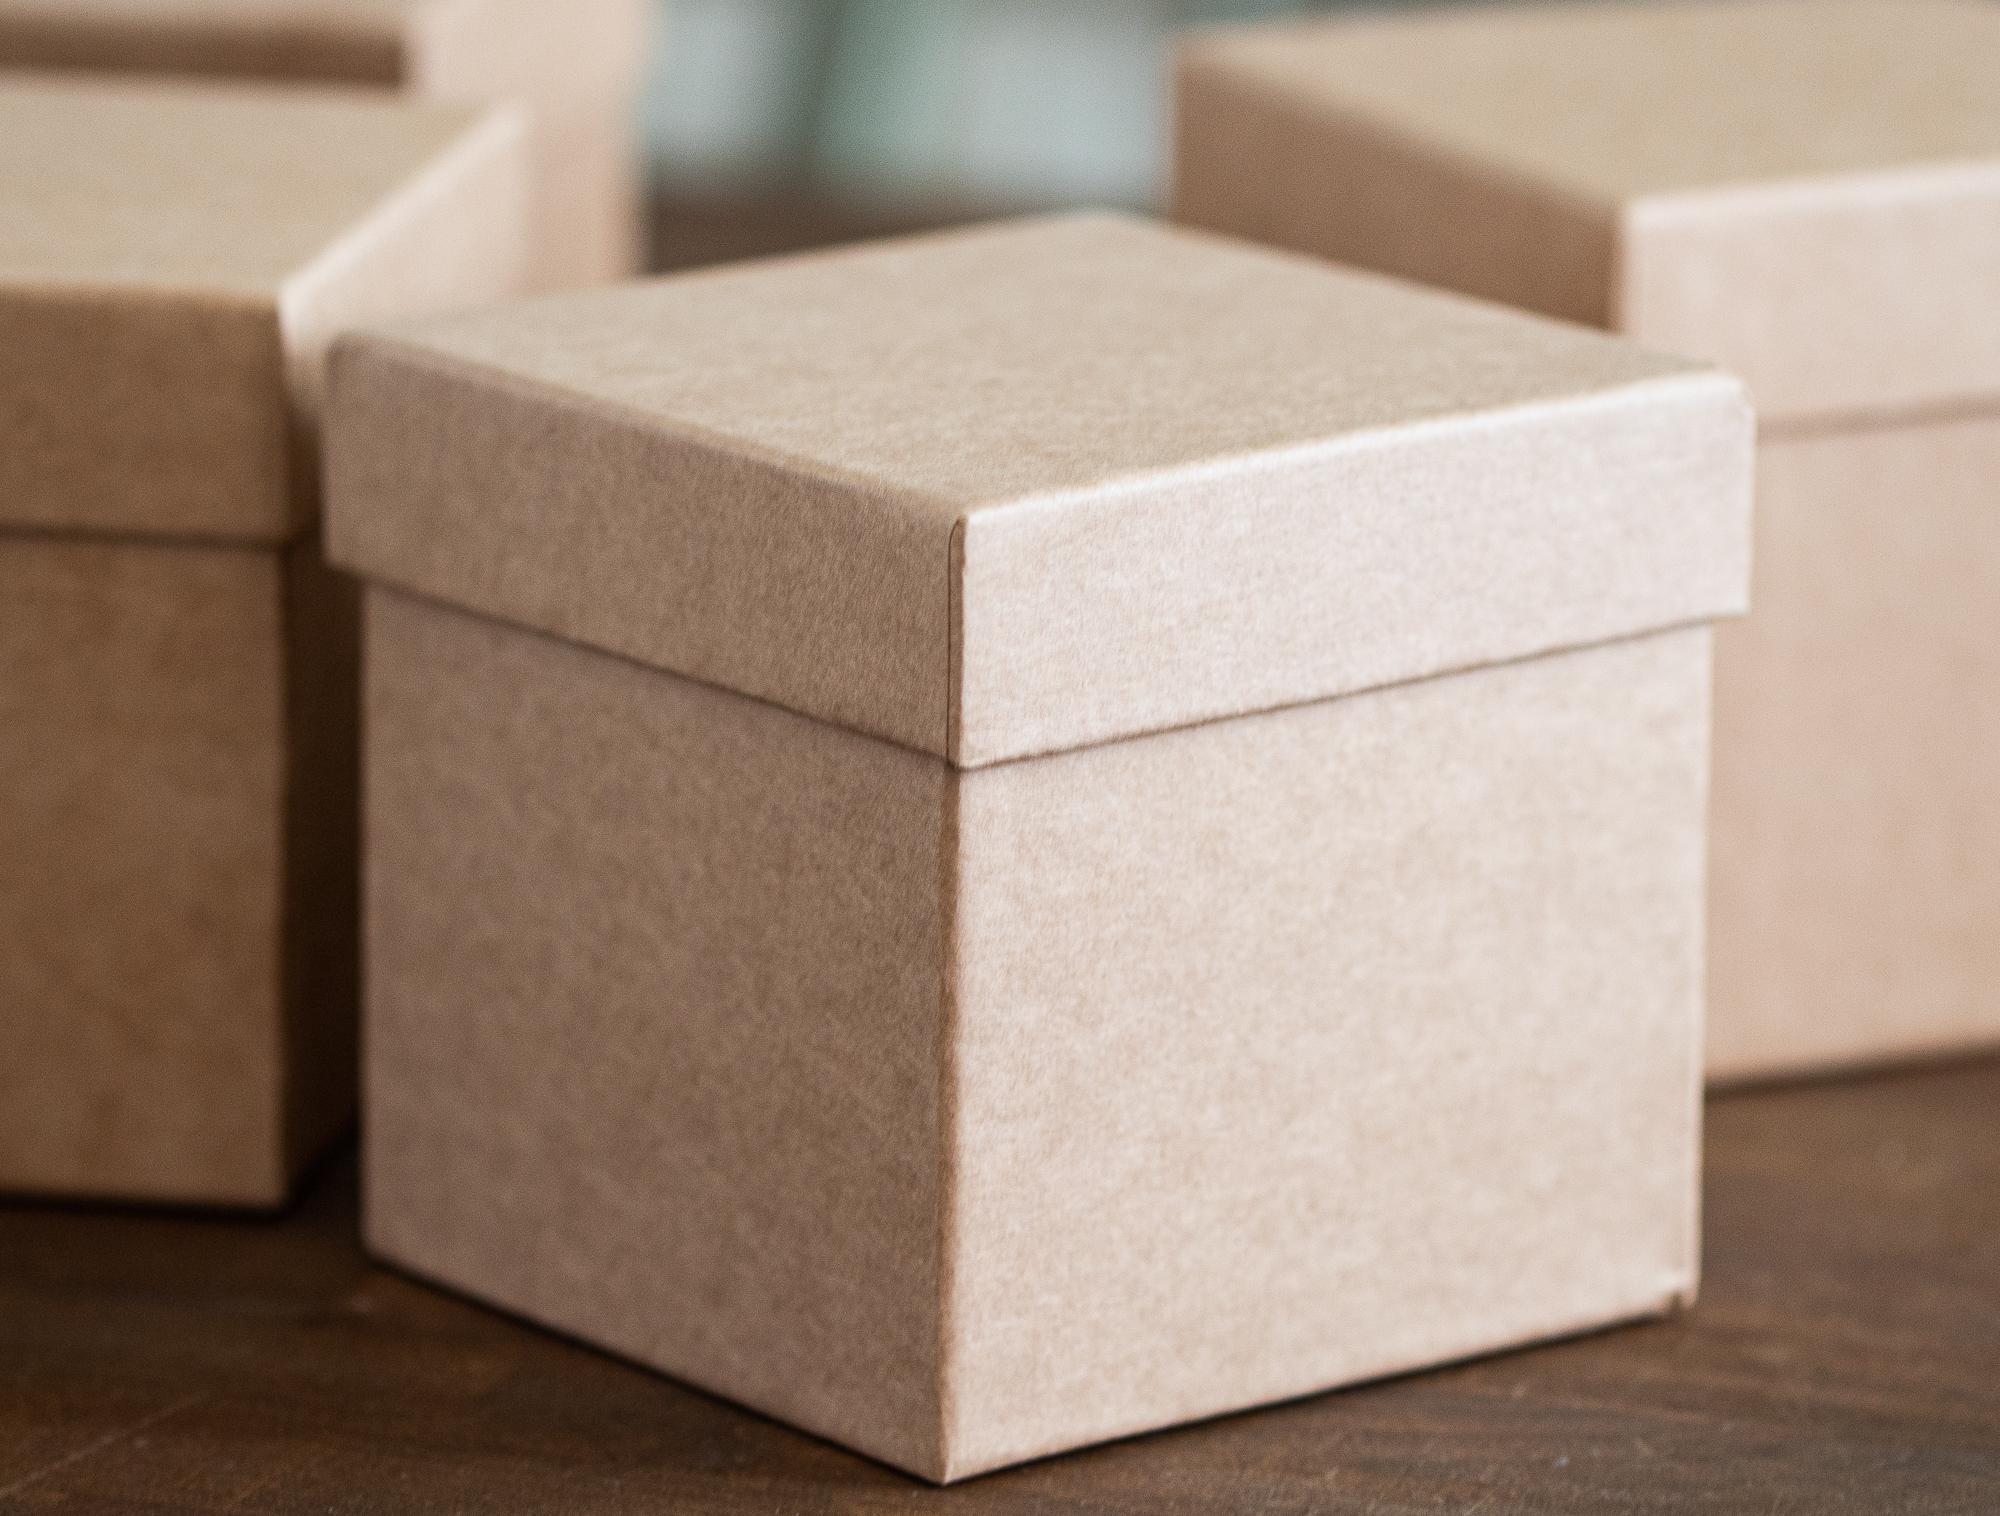 box4 (1 of 1)